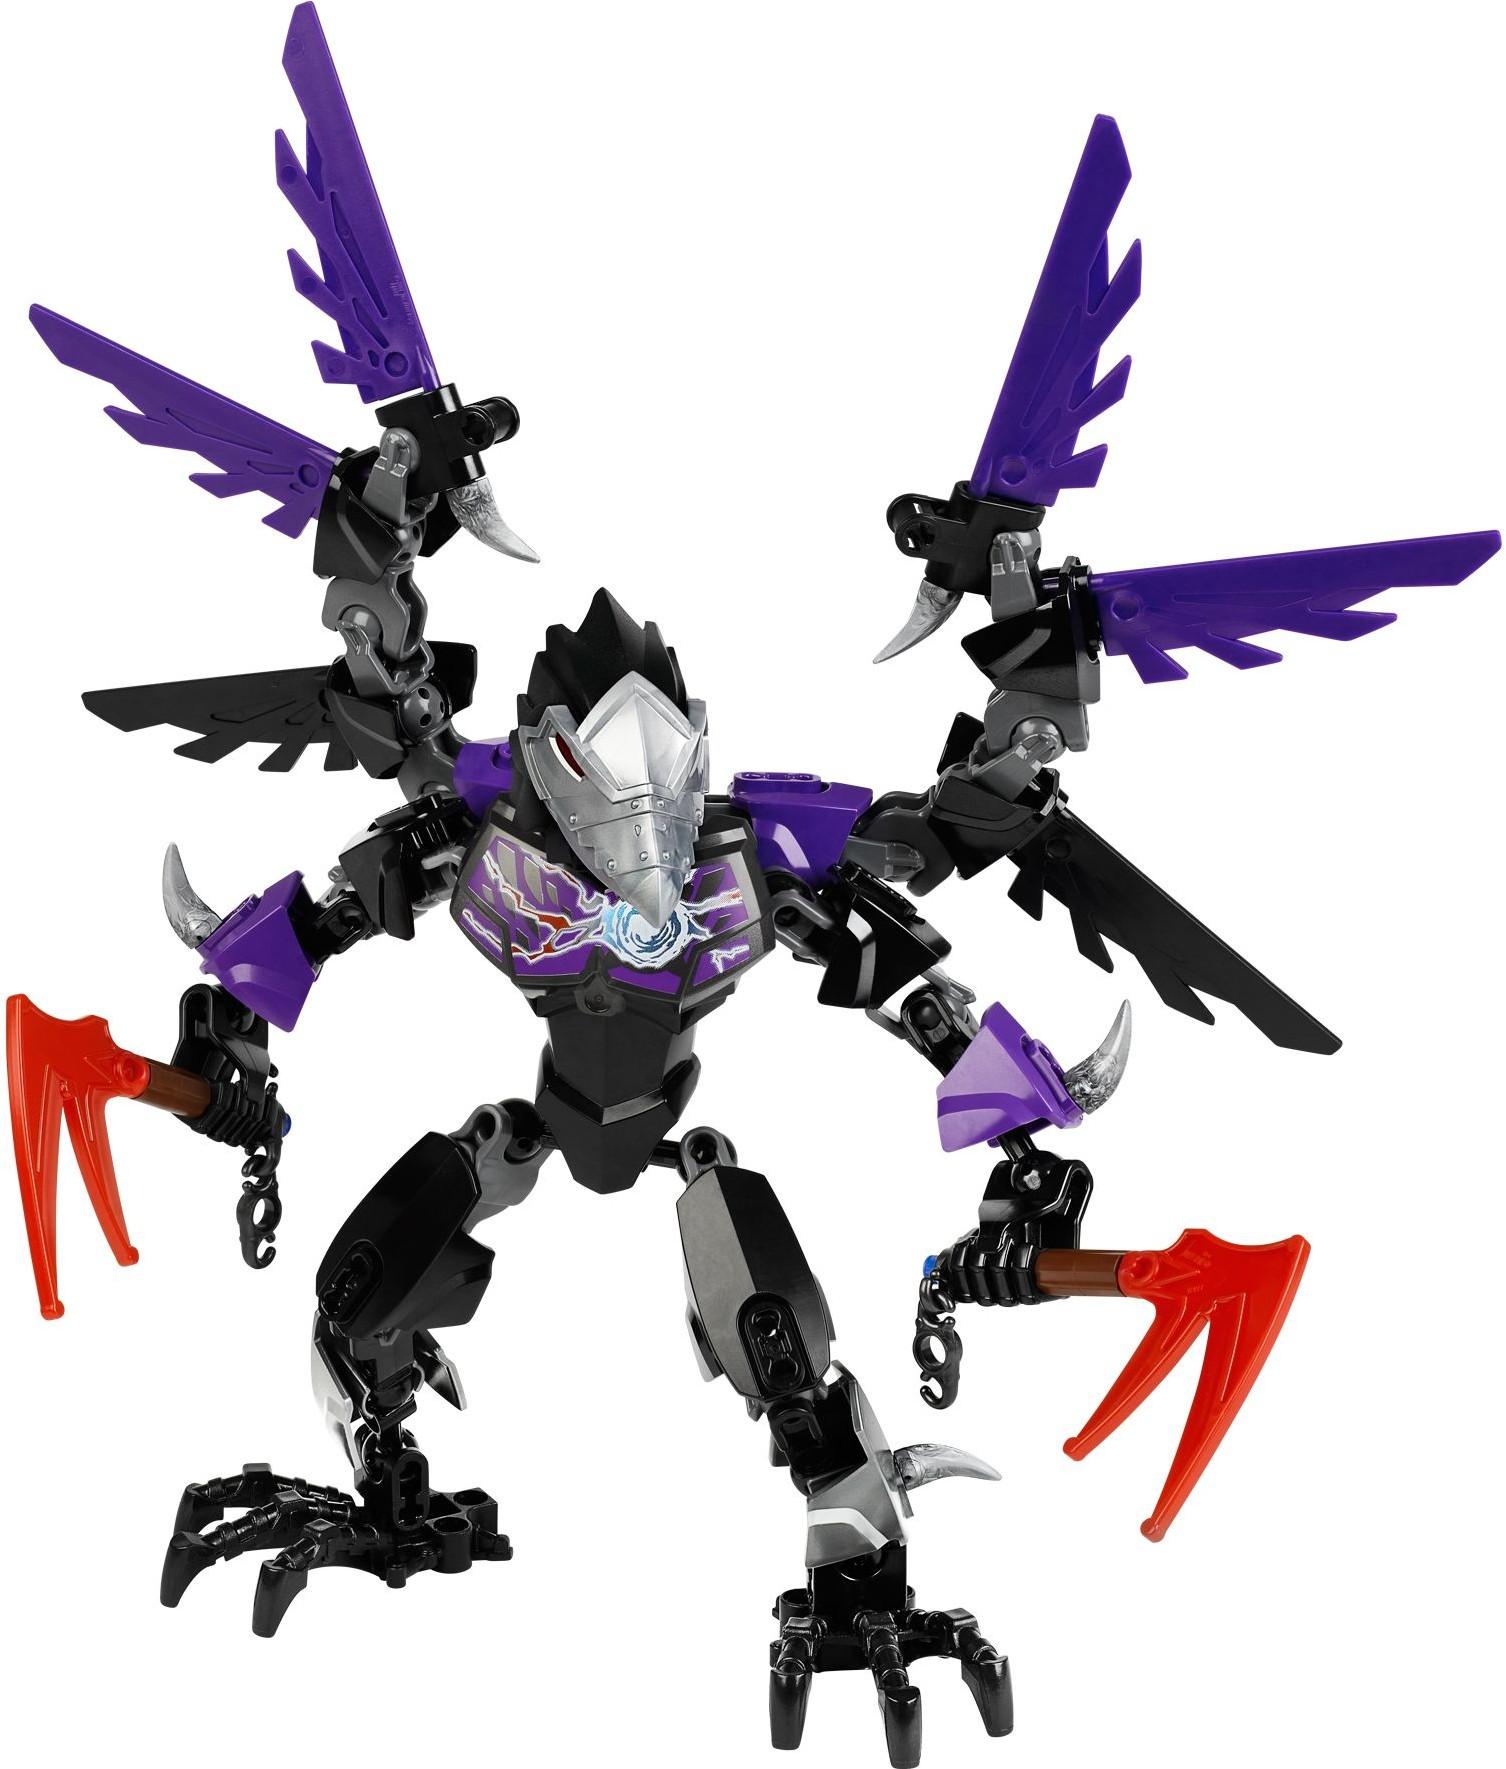 70205 LEGO CHI Razar